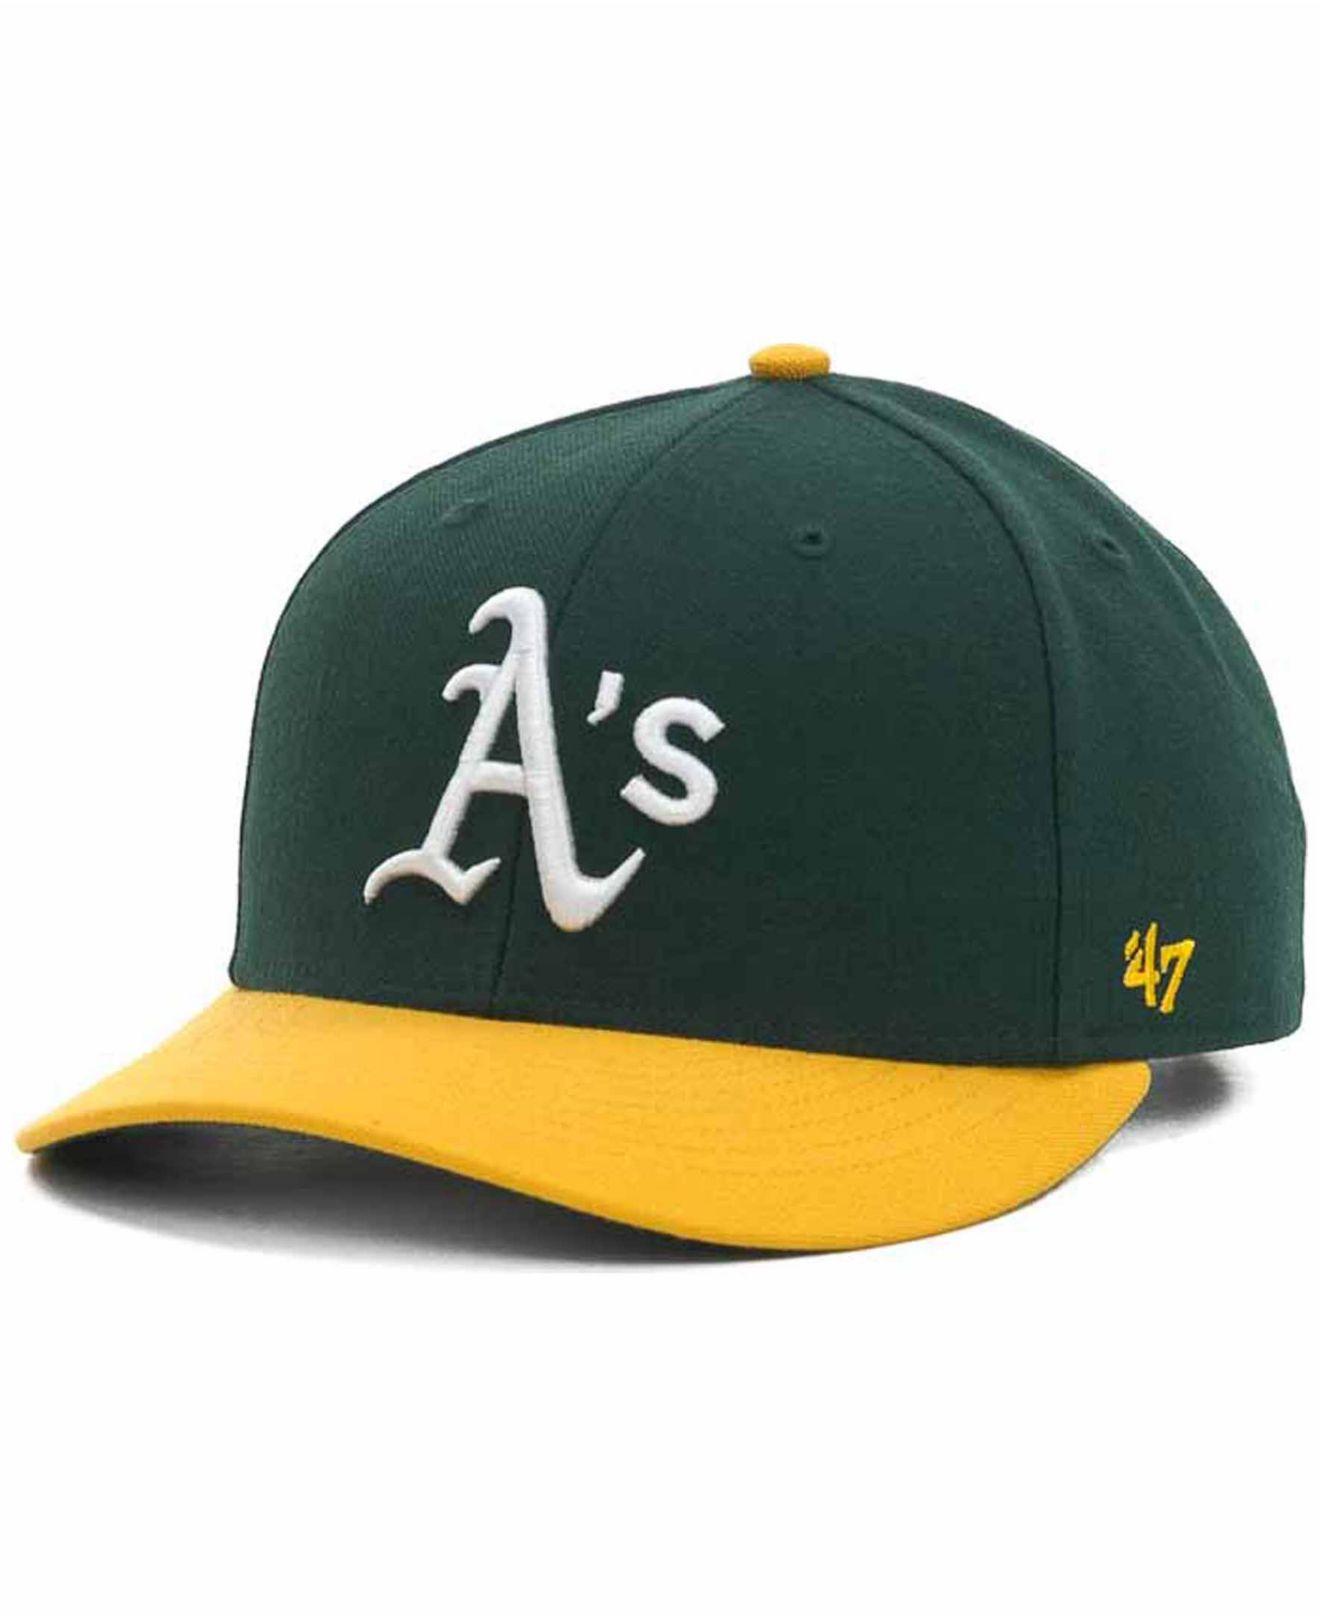 the best attitude 86d85 64669 ... shop lyst 47 brand oakland athletics mvp cap in green for men a8c90  26690